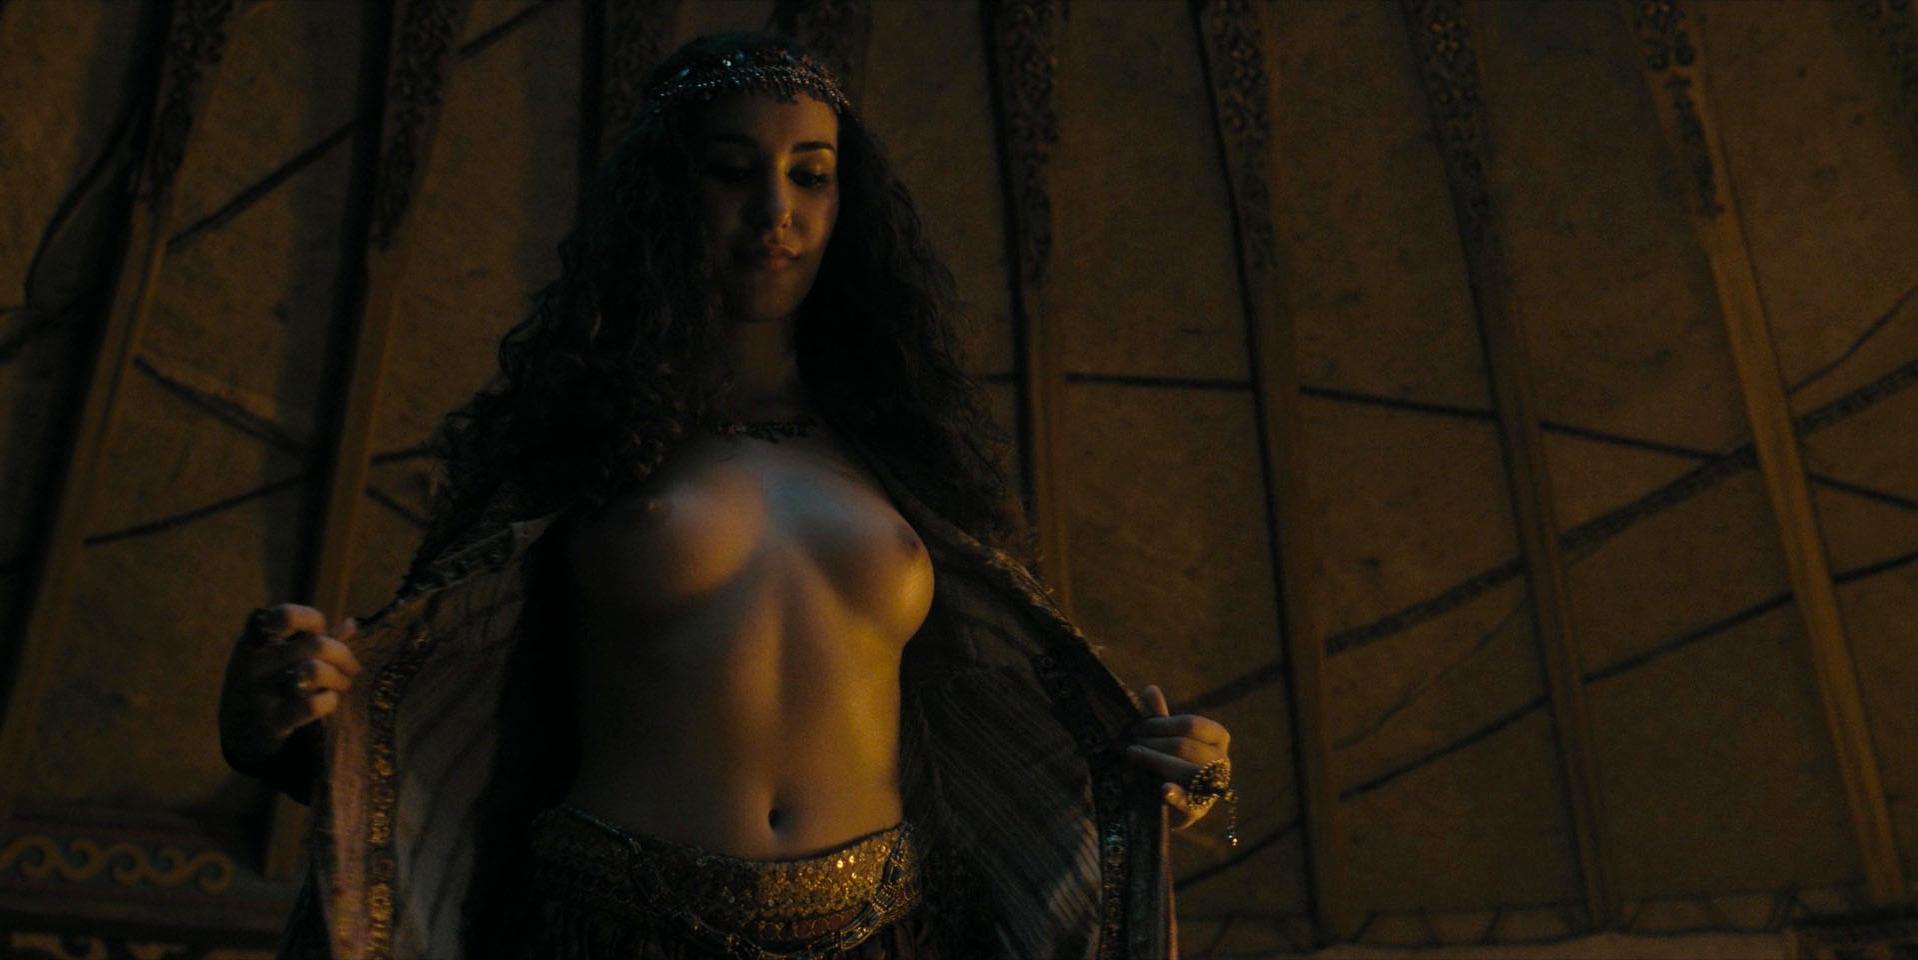 Laura Prats nude - Marco Polo s02e06 (2016)